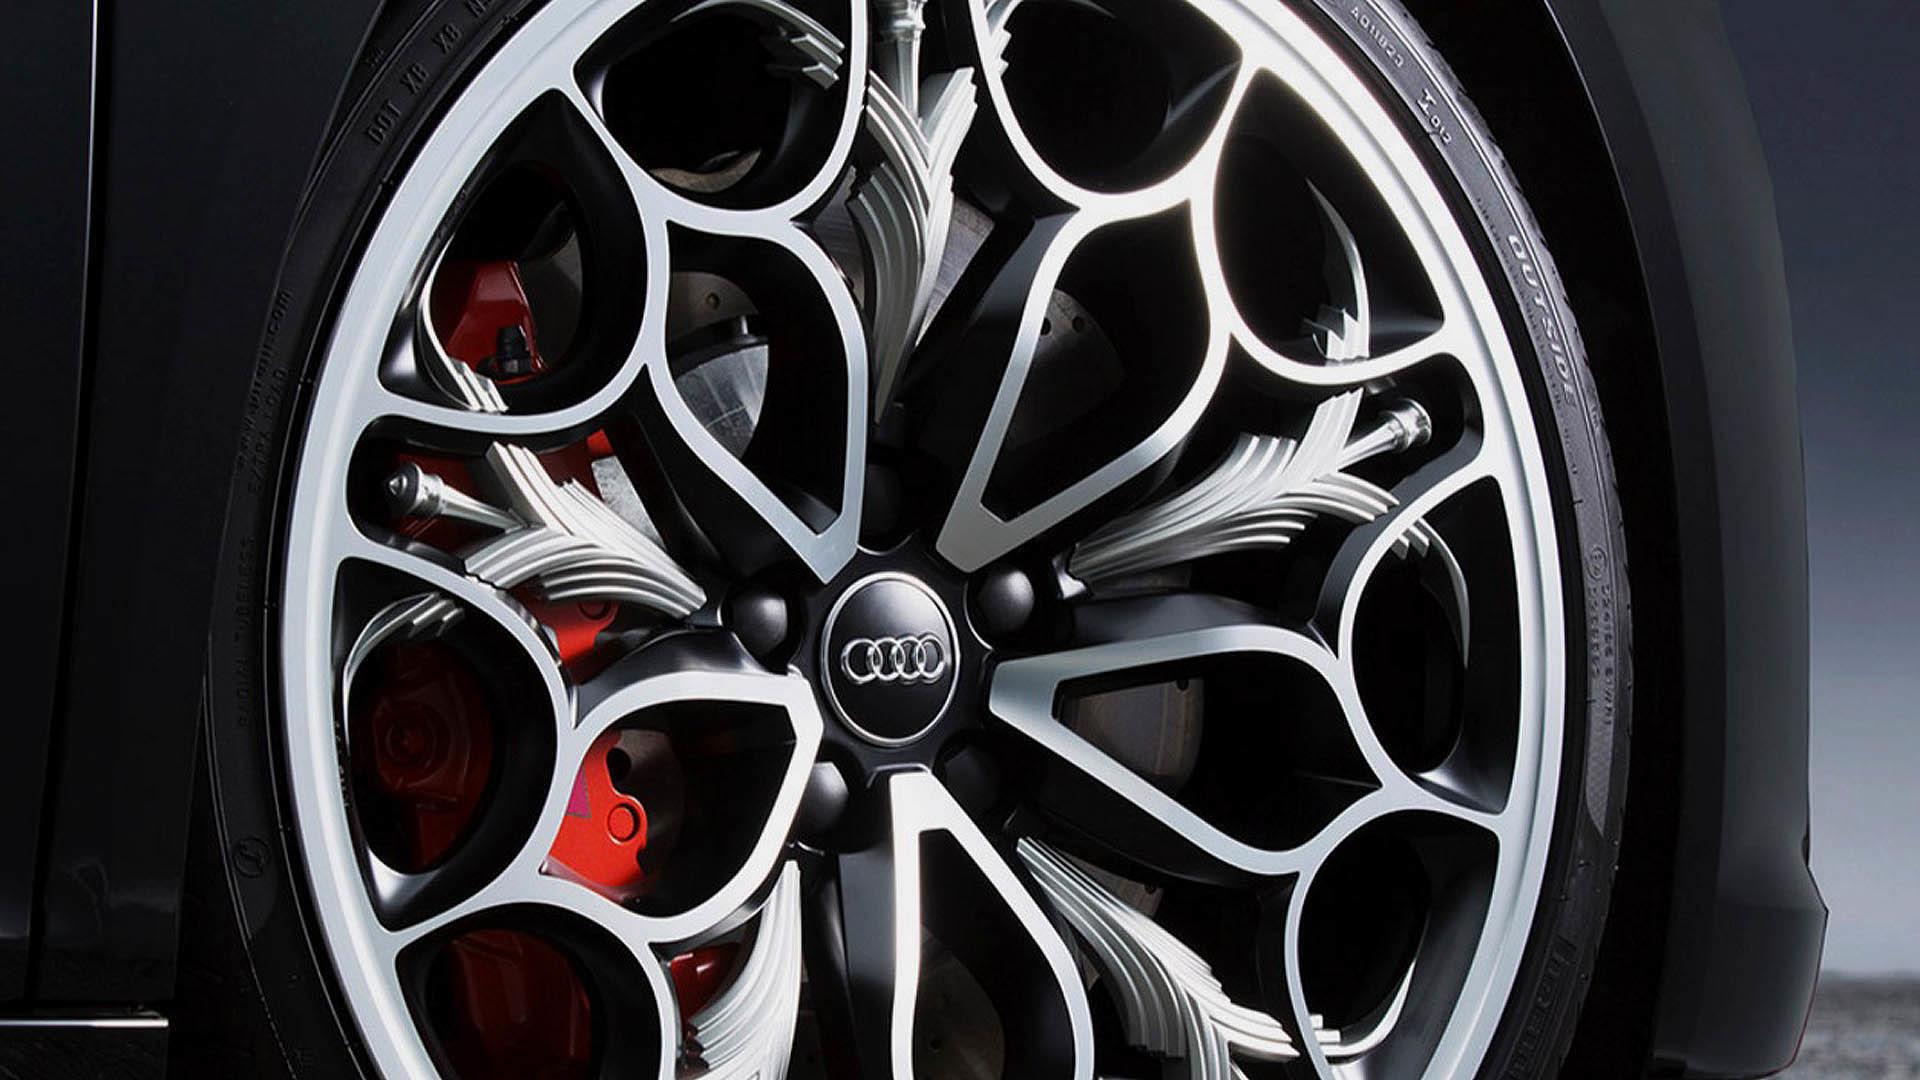 FFXV Regalia-themed Audi R8 Wheel wallpaper